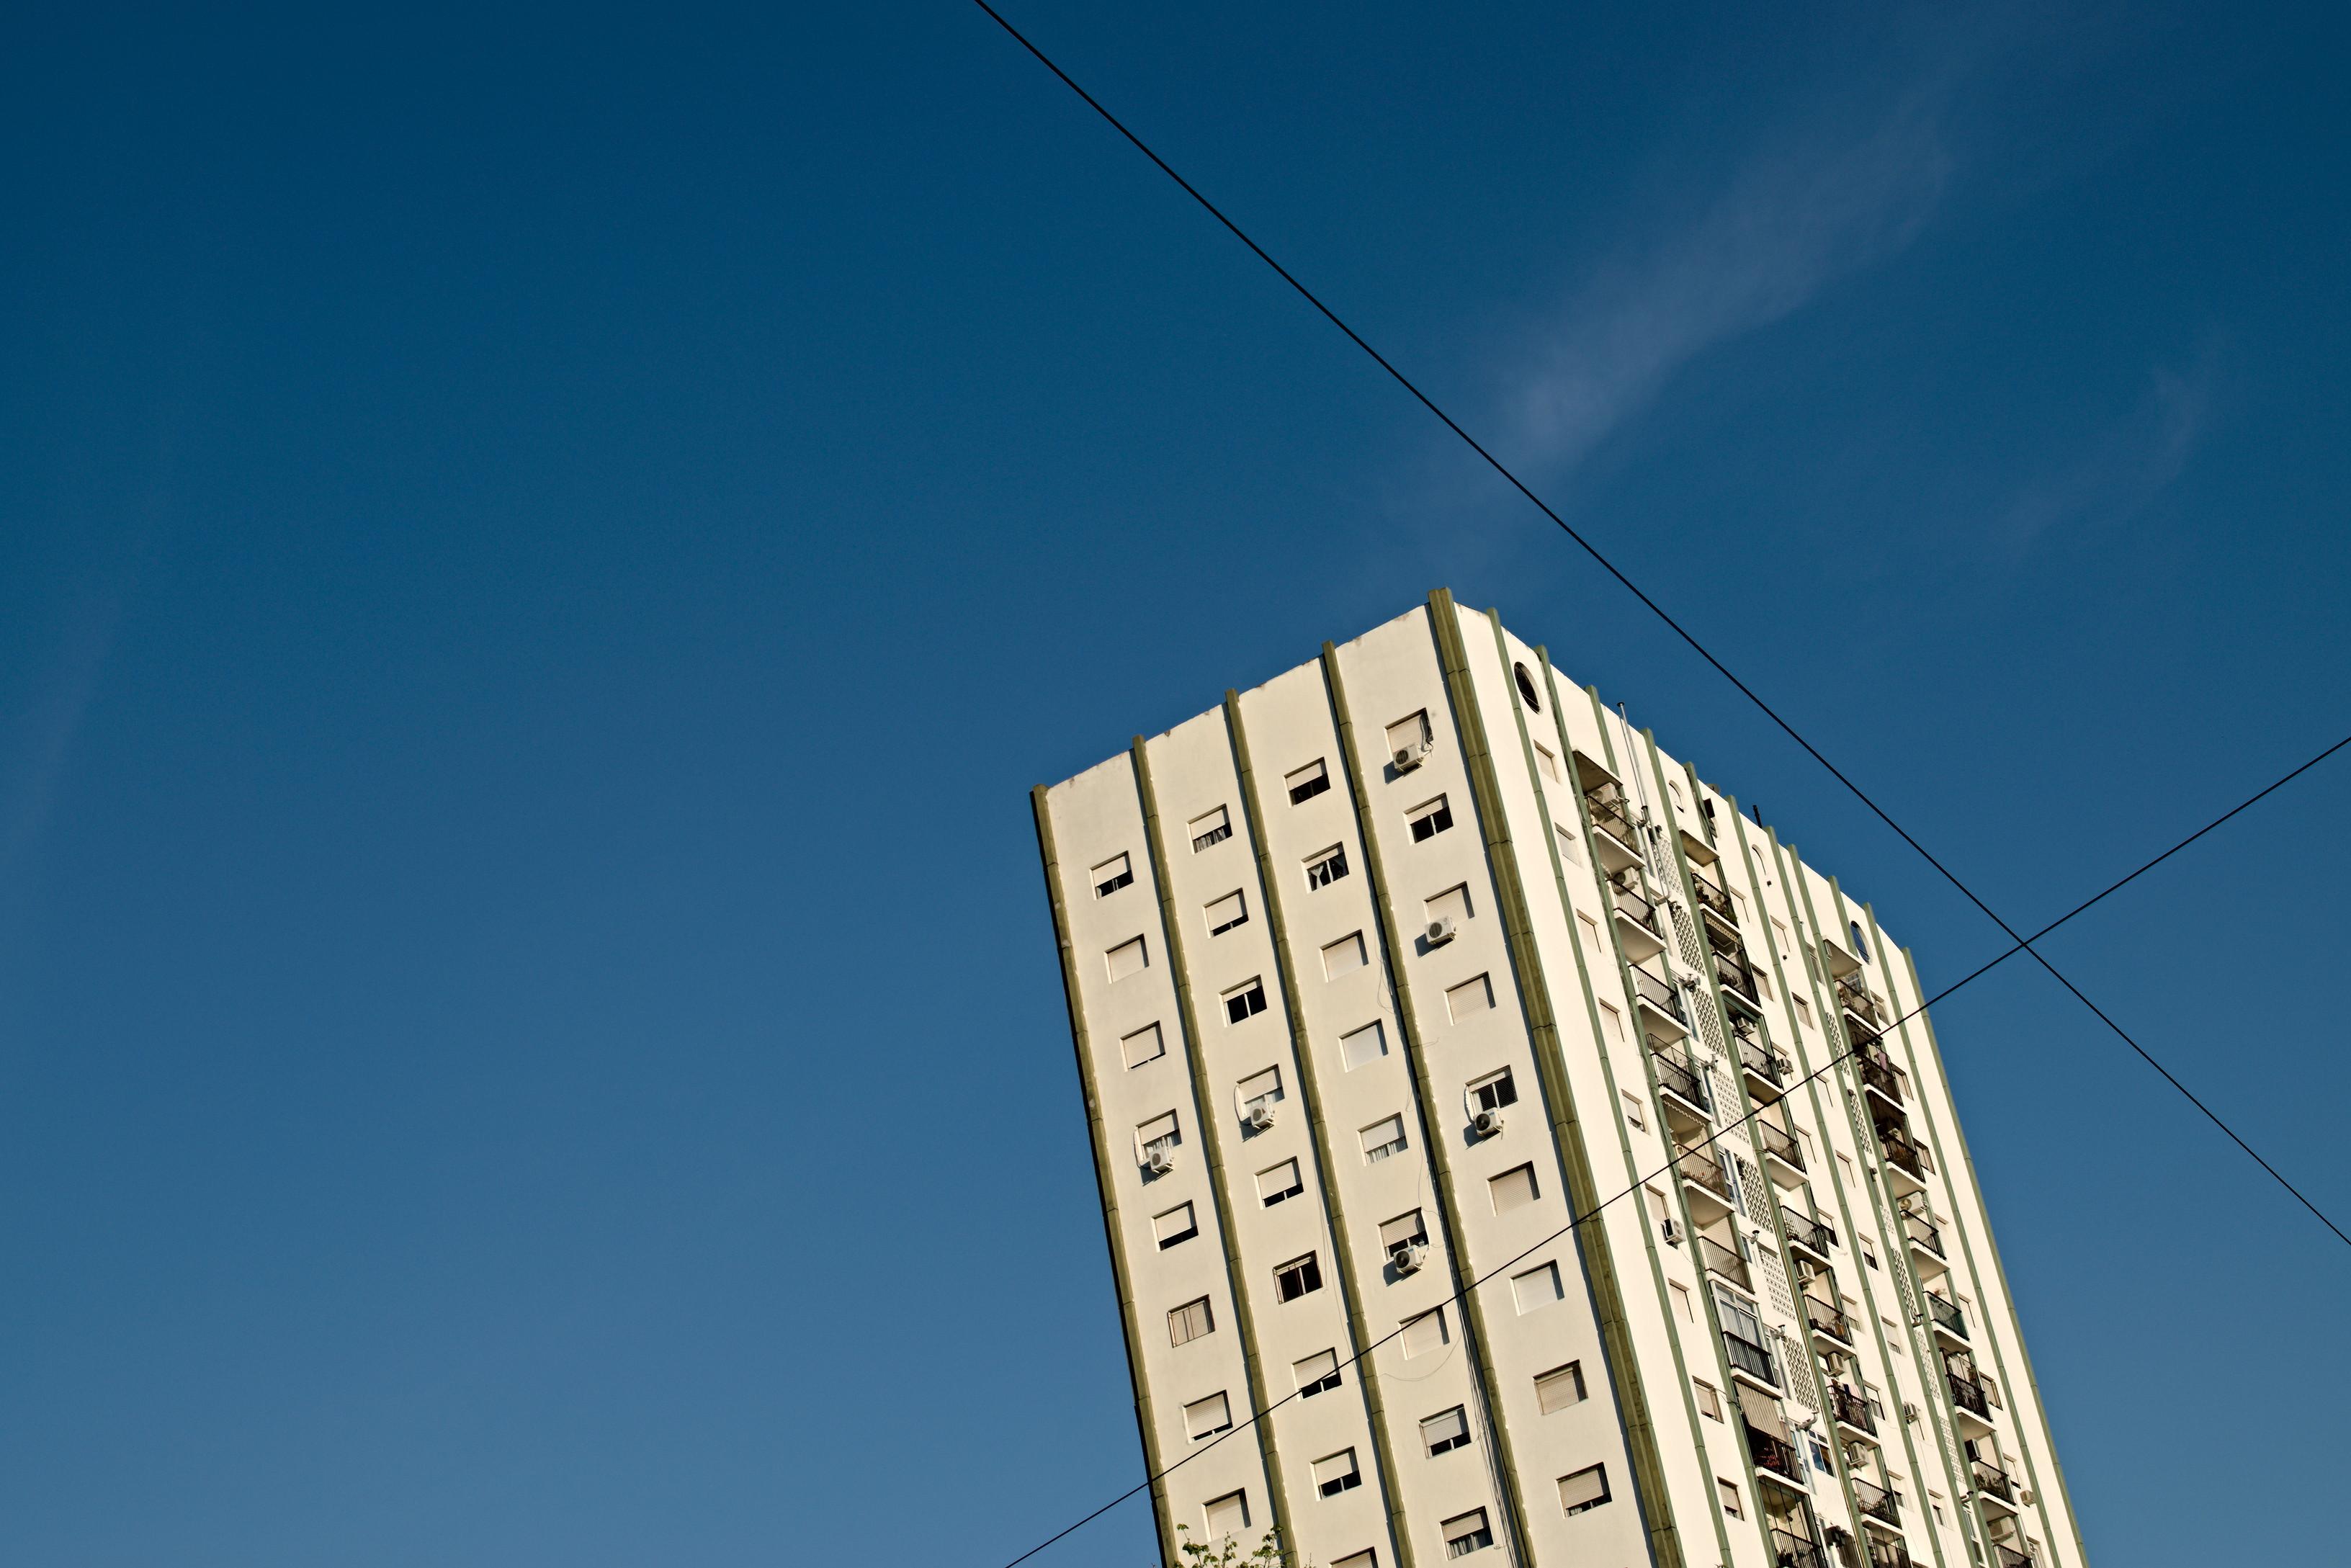 Un edificio acompañado de cables.